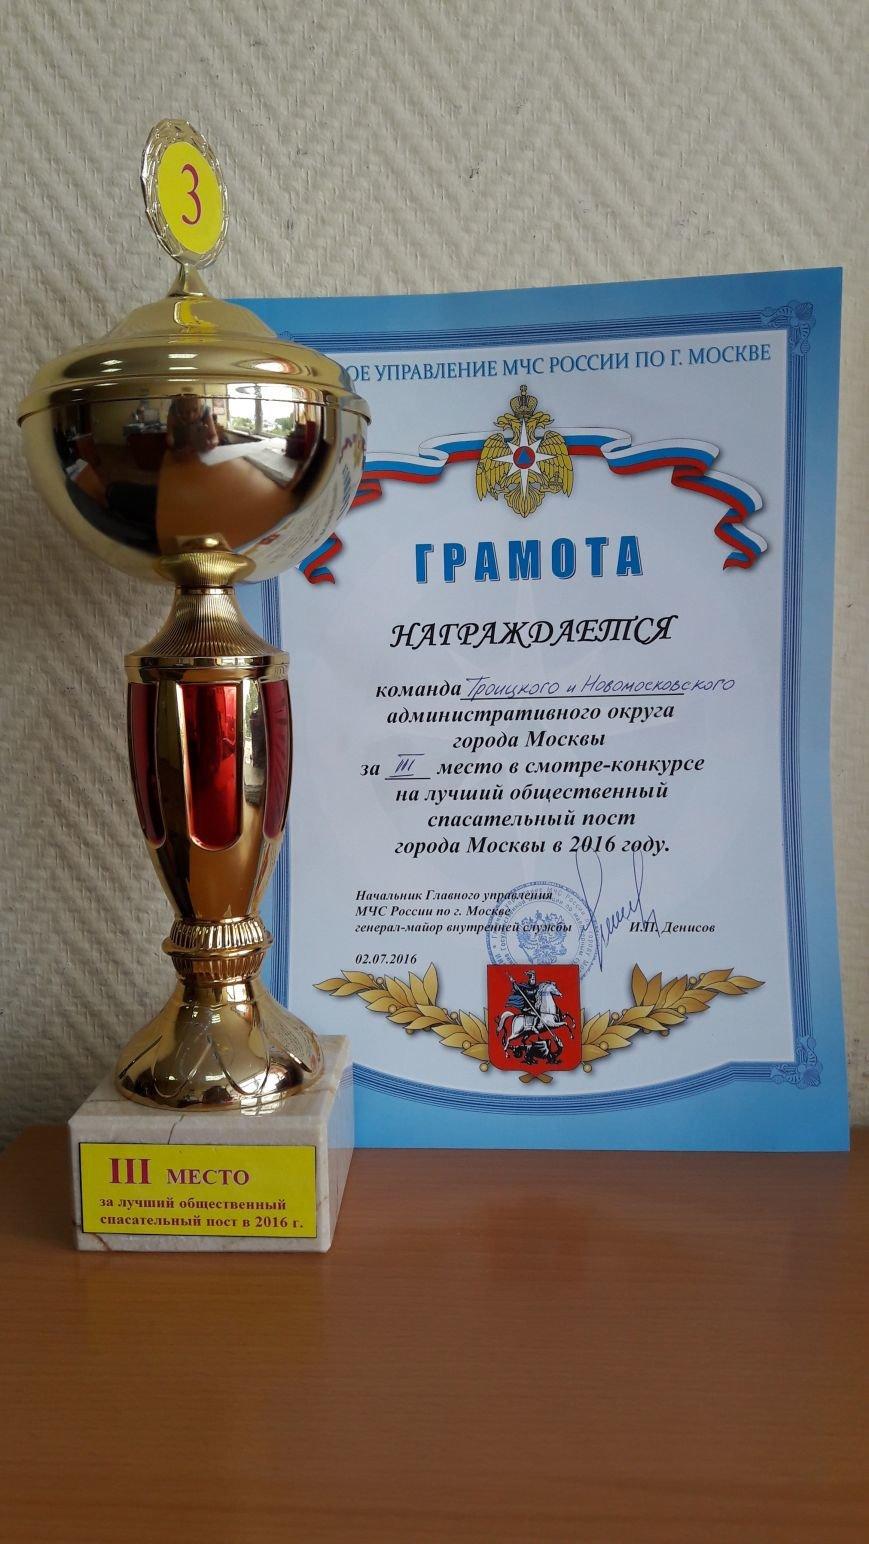 Команда МЧС ТиНАО заняла призовое место в конкурсе спасателей, фото-3